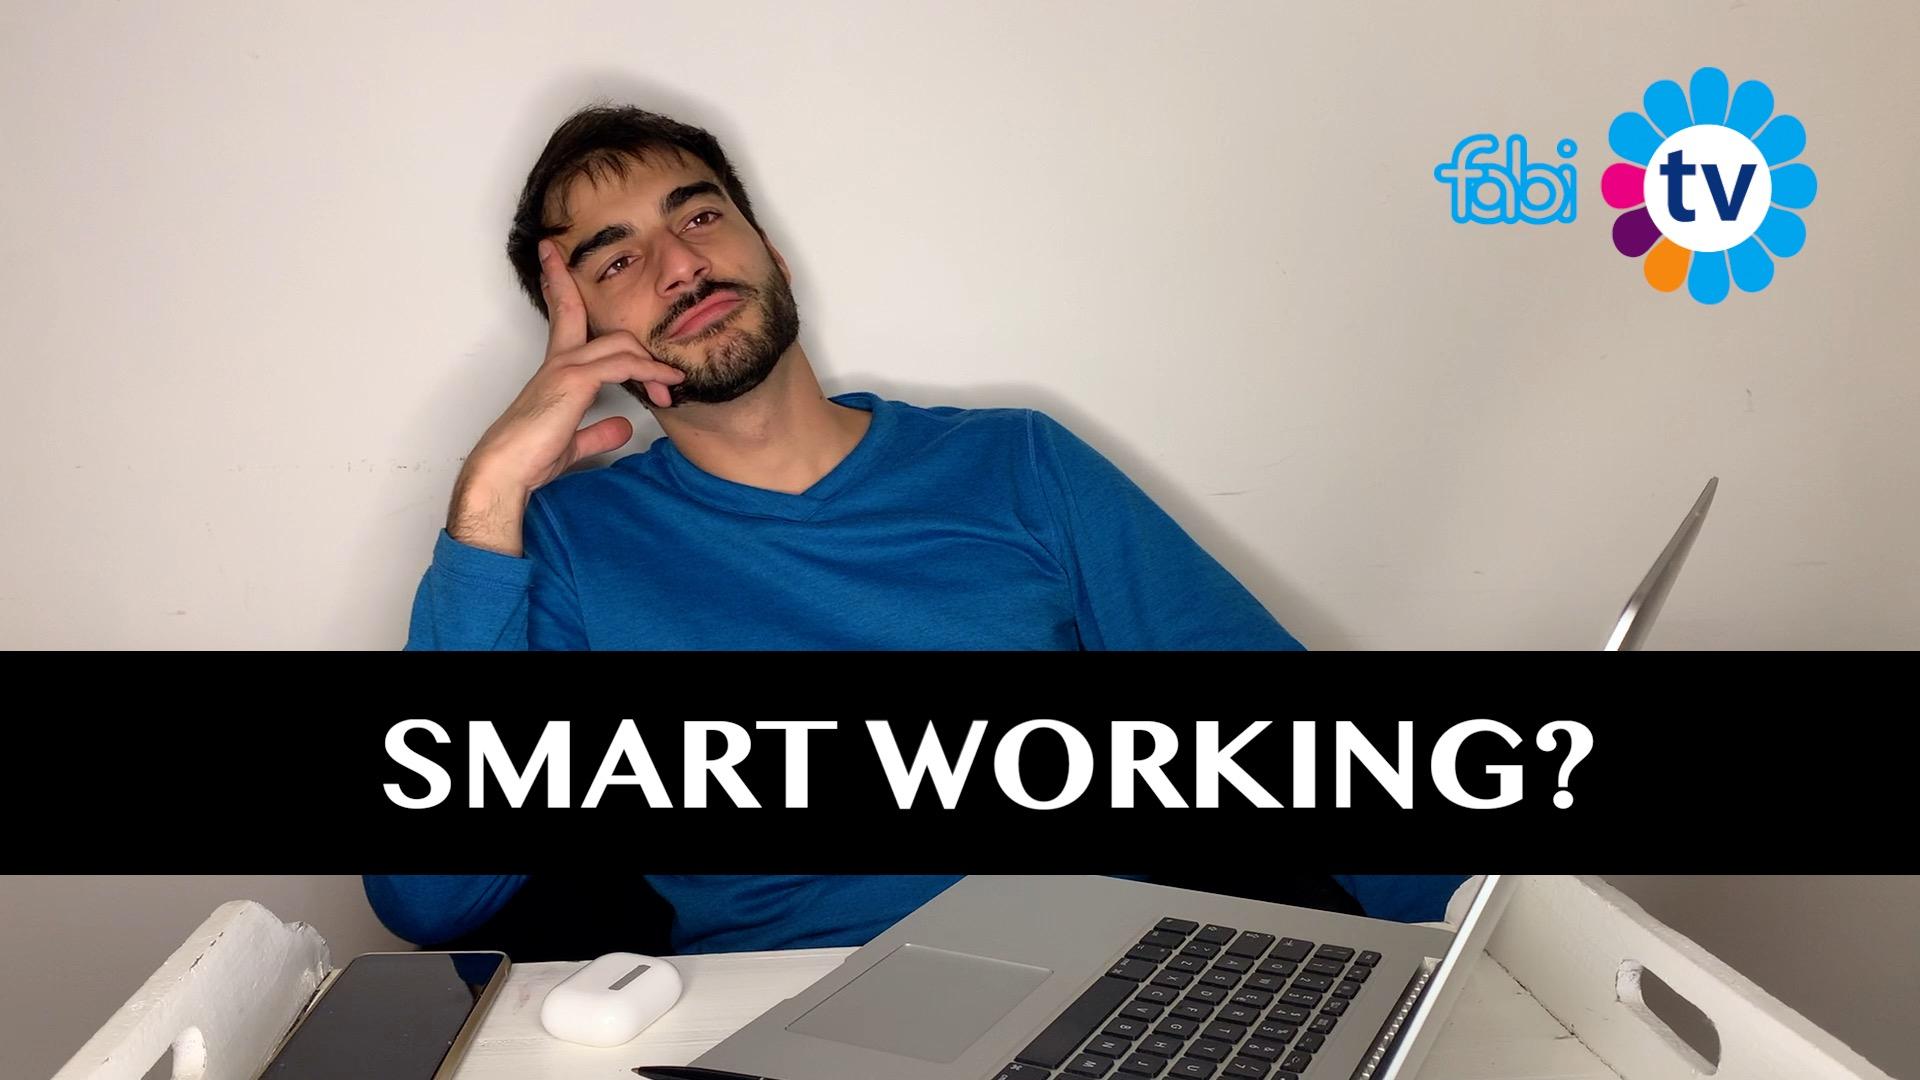 SMART WORKING?